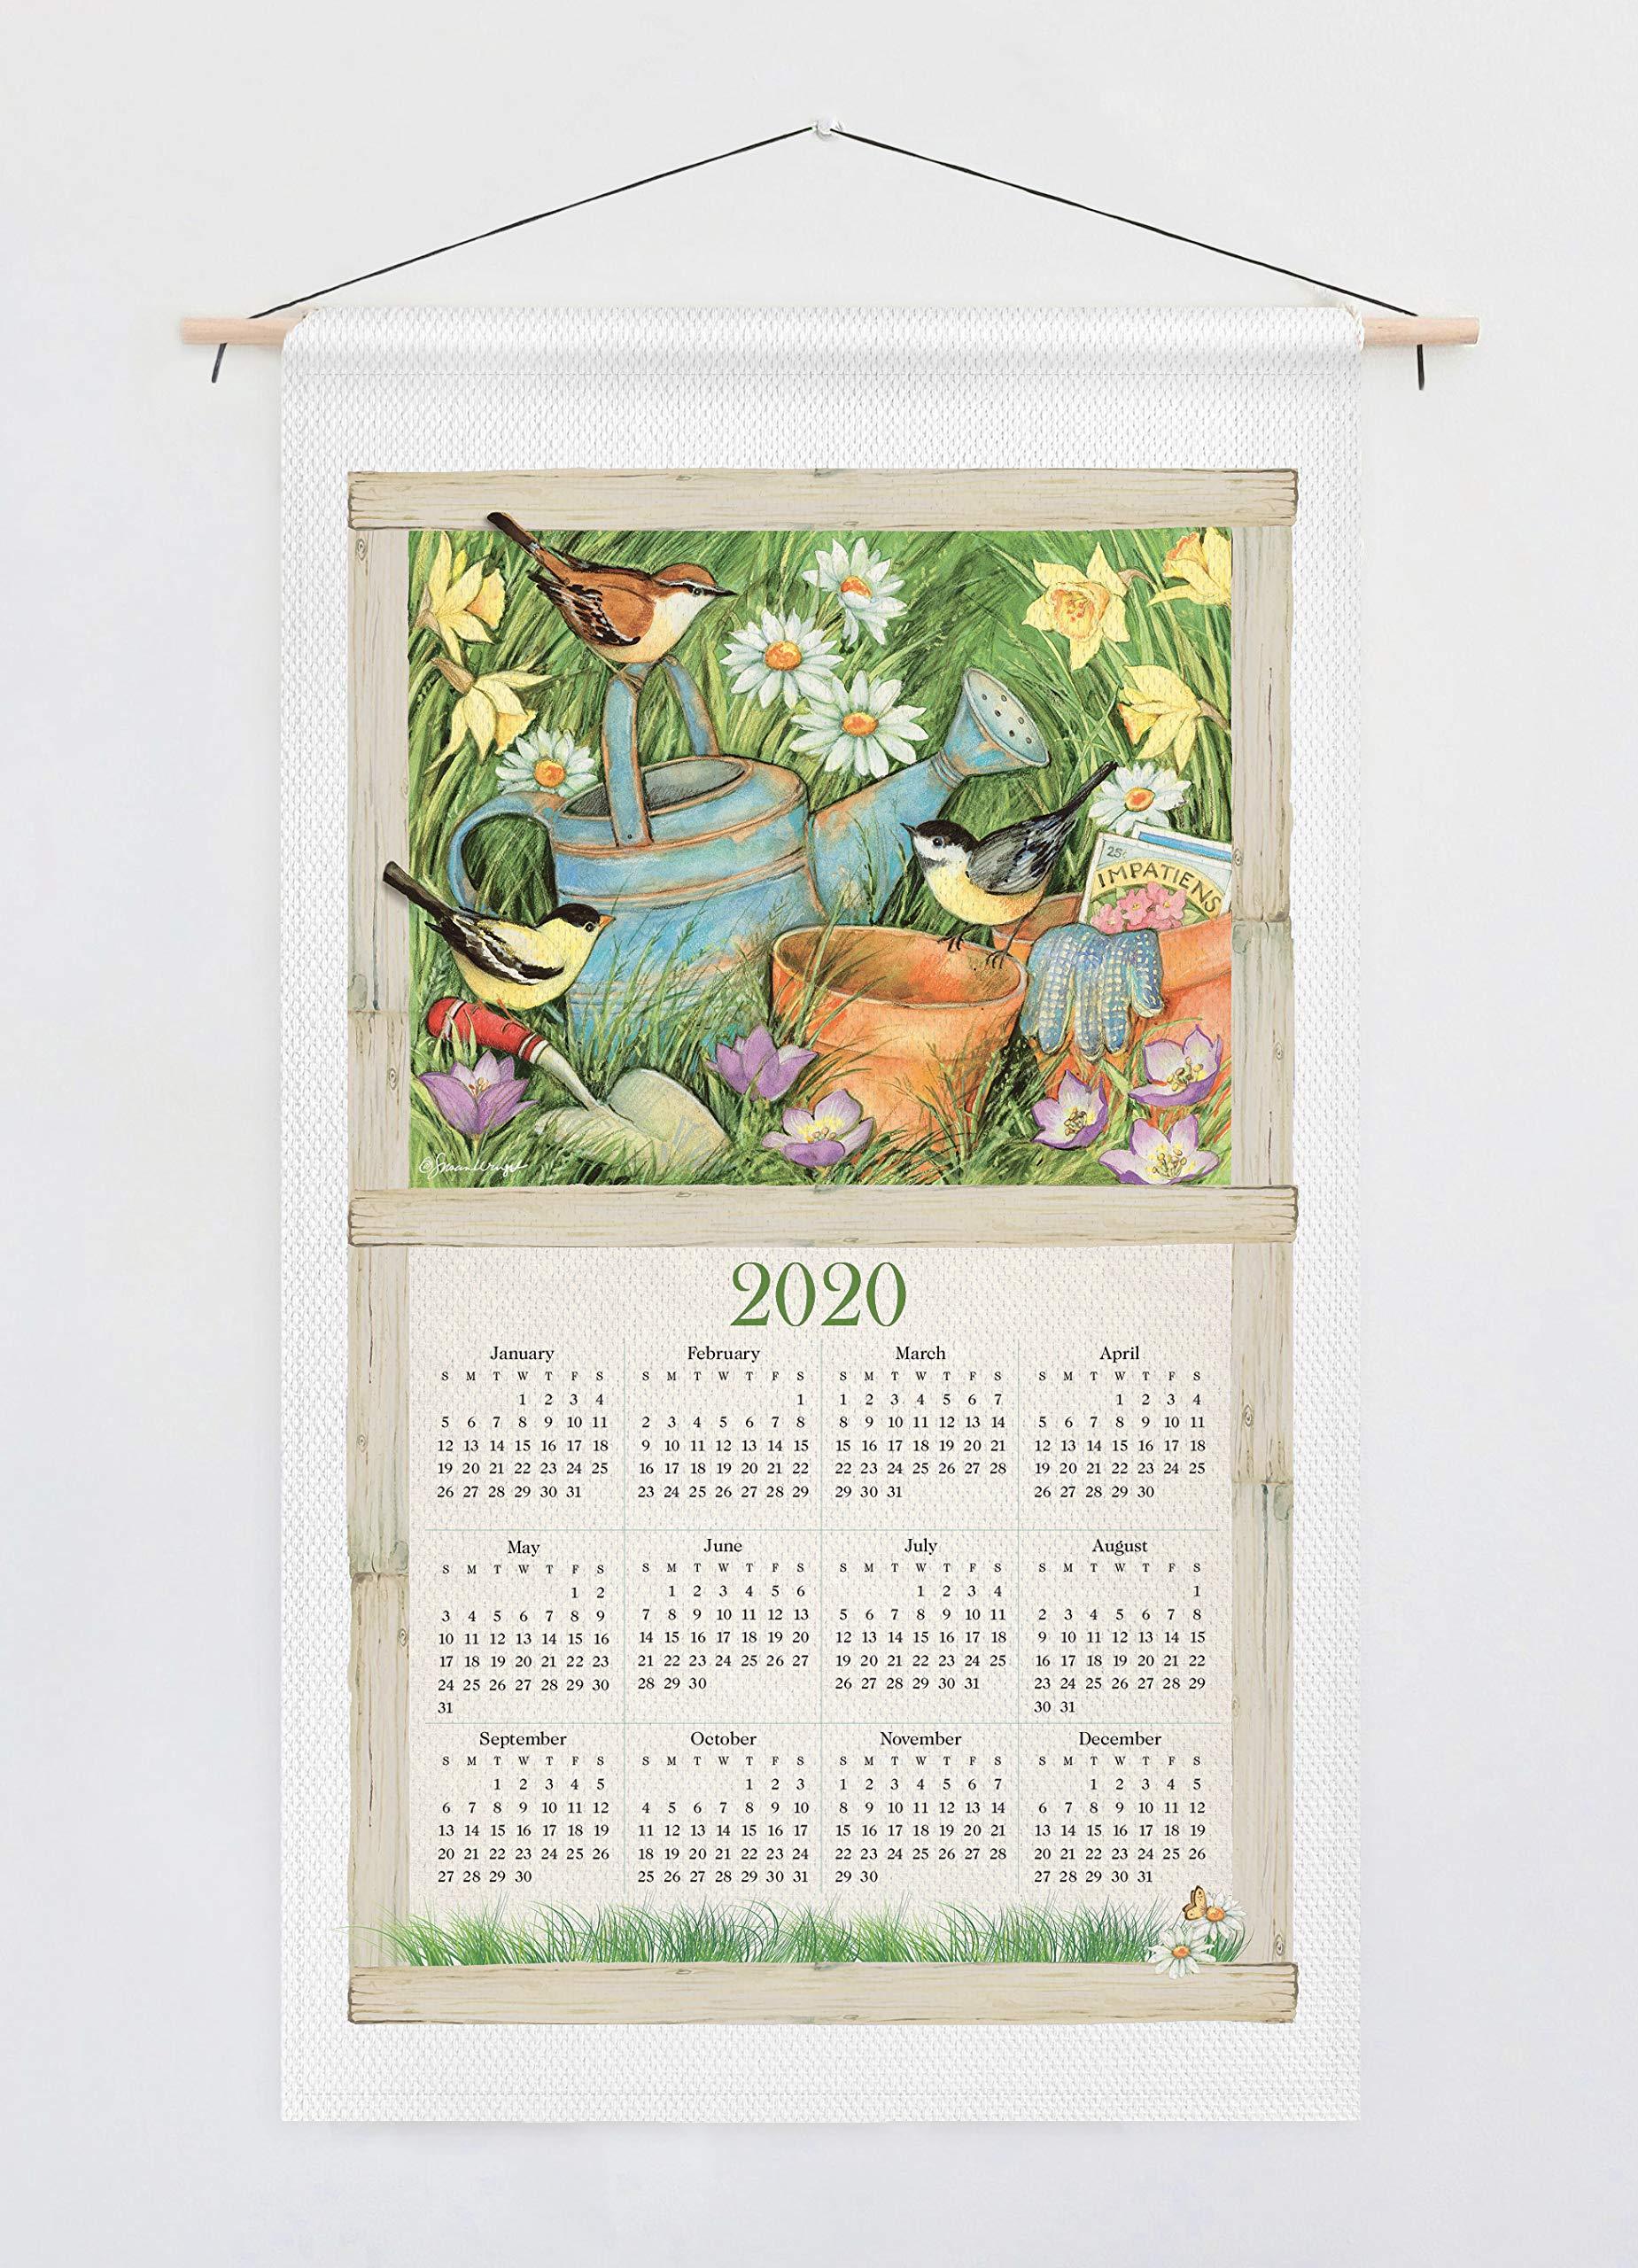 February Heart 2020 Calendar Home Is Where the Heart Is 2020 Calendar Towel: Willow Creek Press